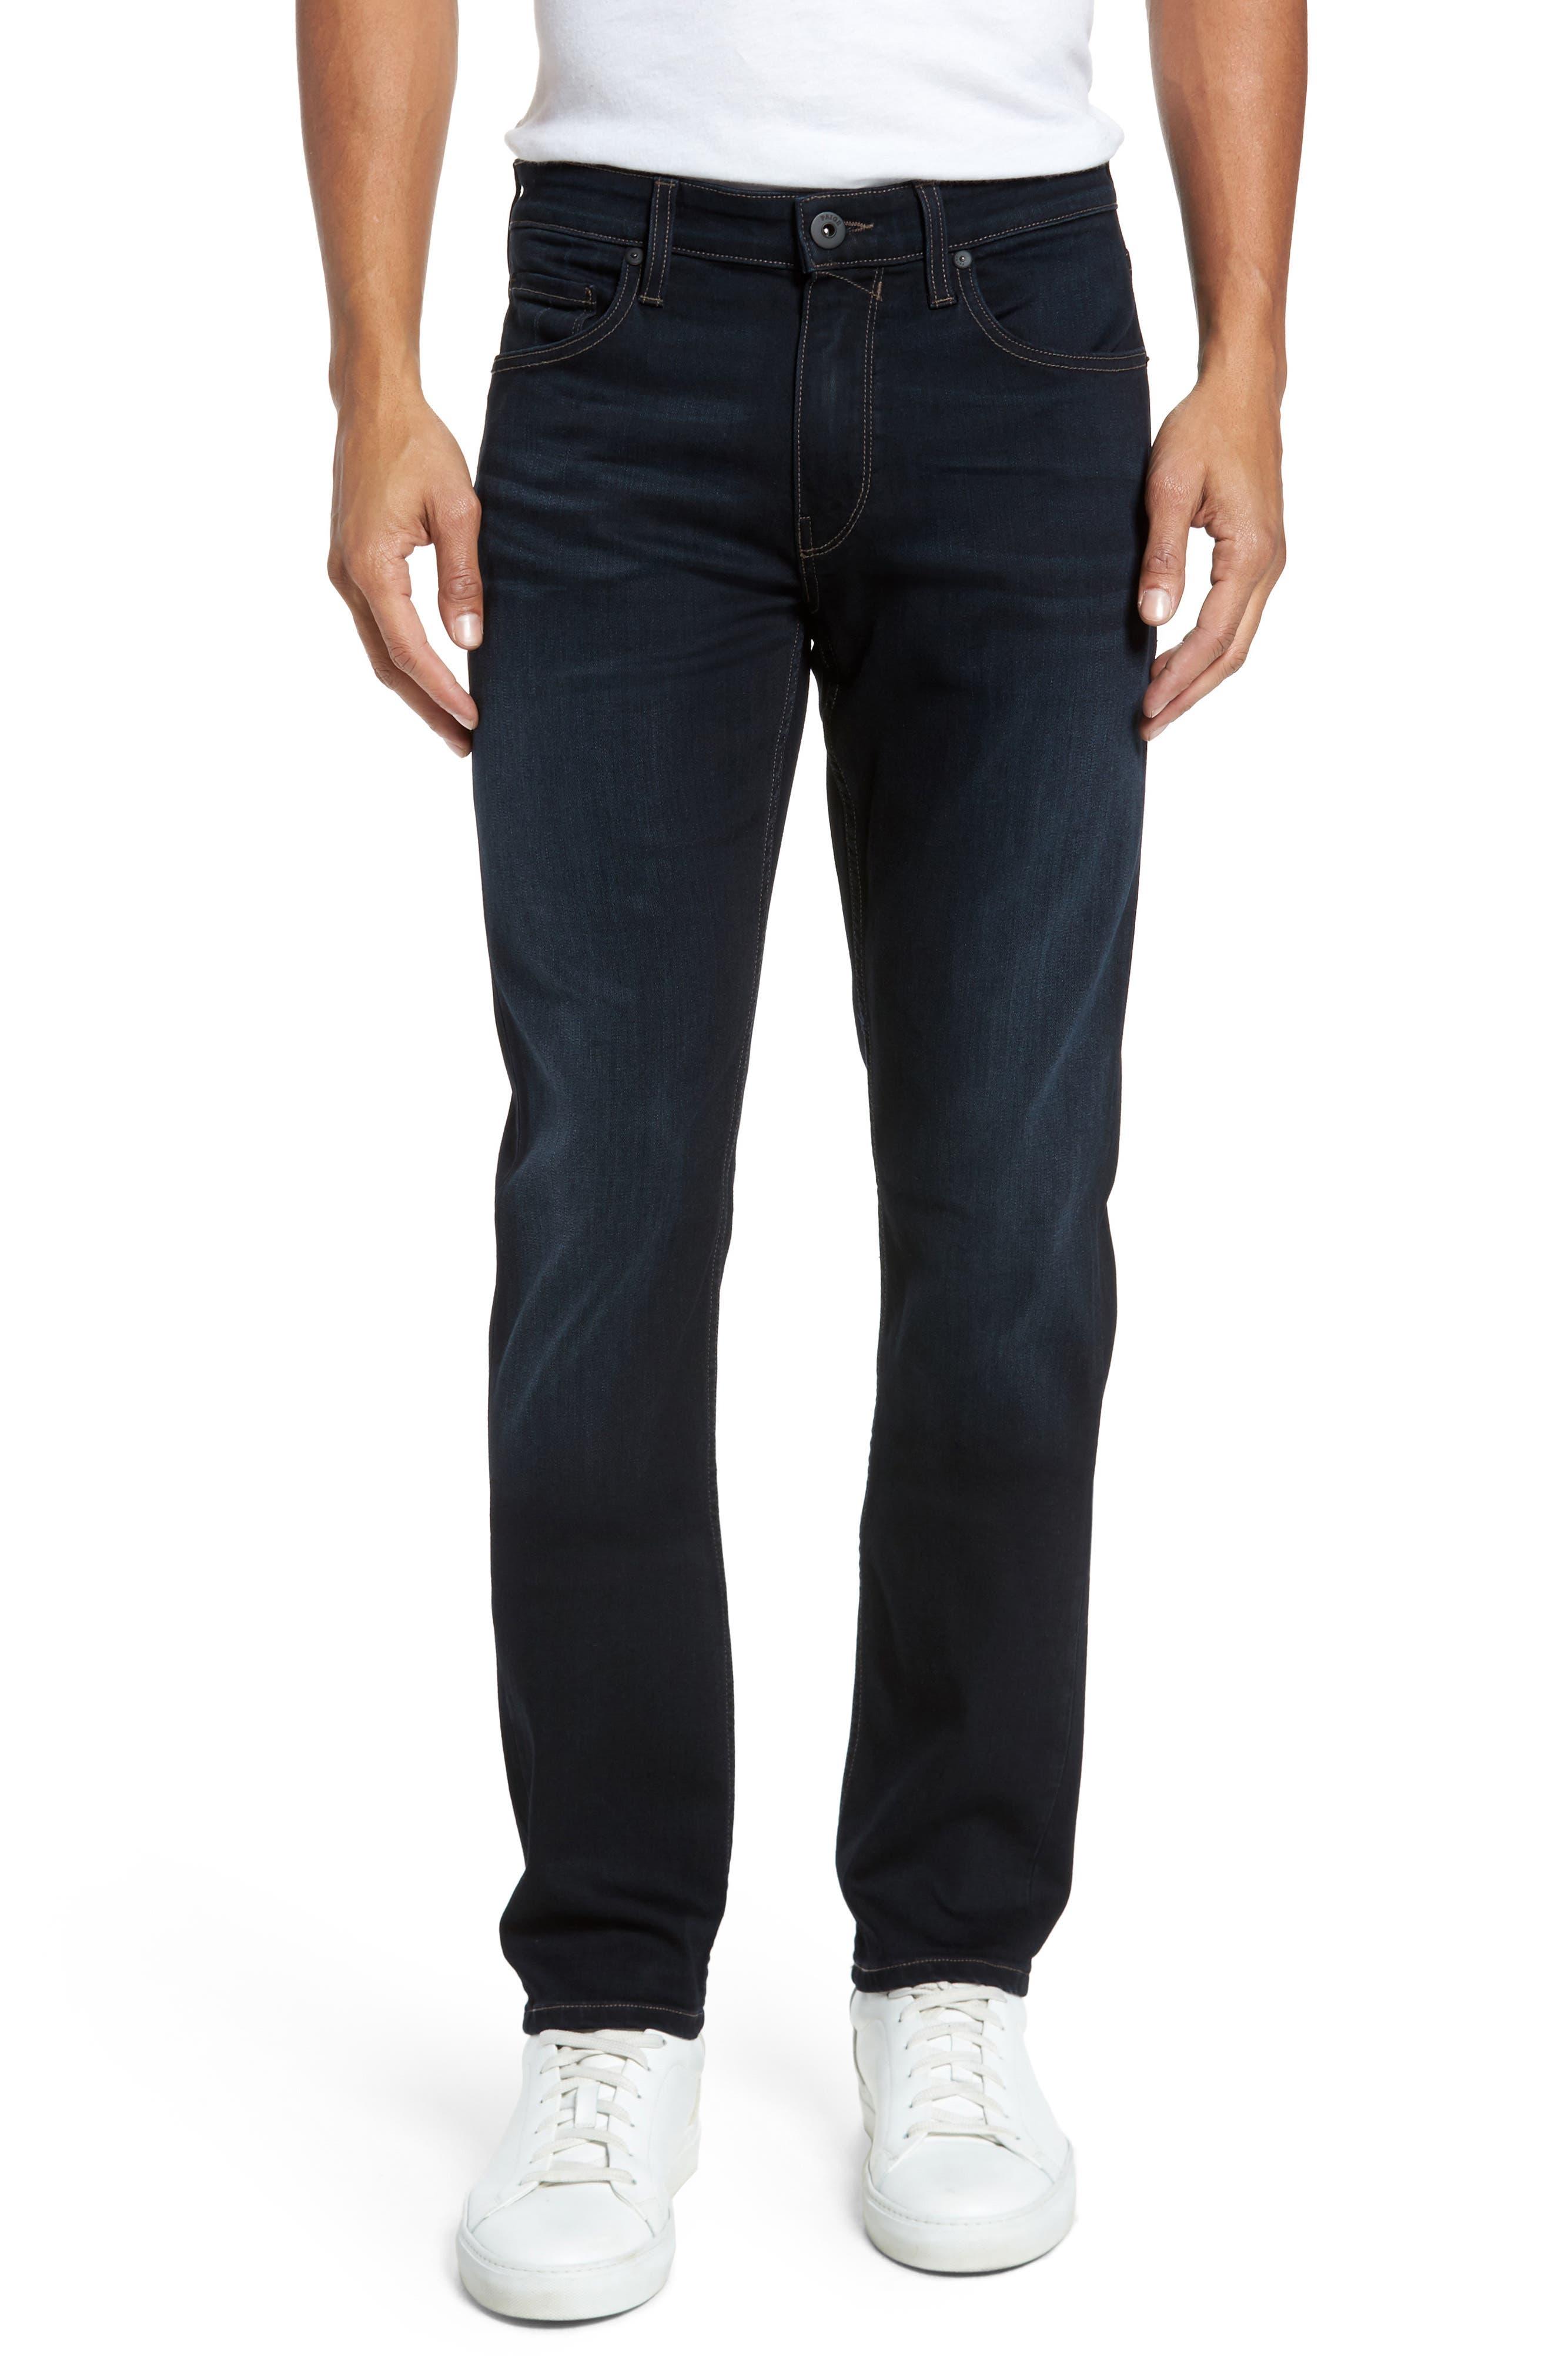 Alternate Image 1 Selected - PAIGE Transcend - Lennox Slim Fit Jeans (Rafter)